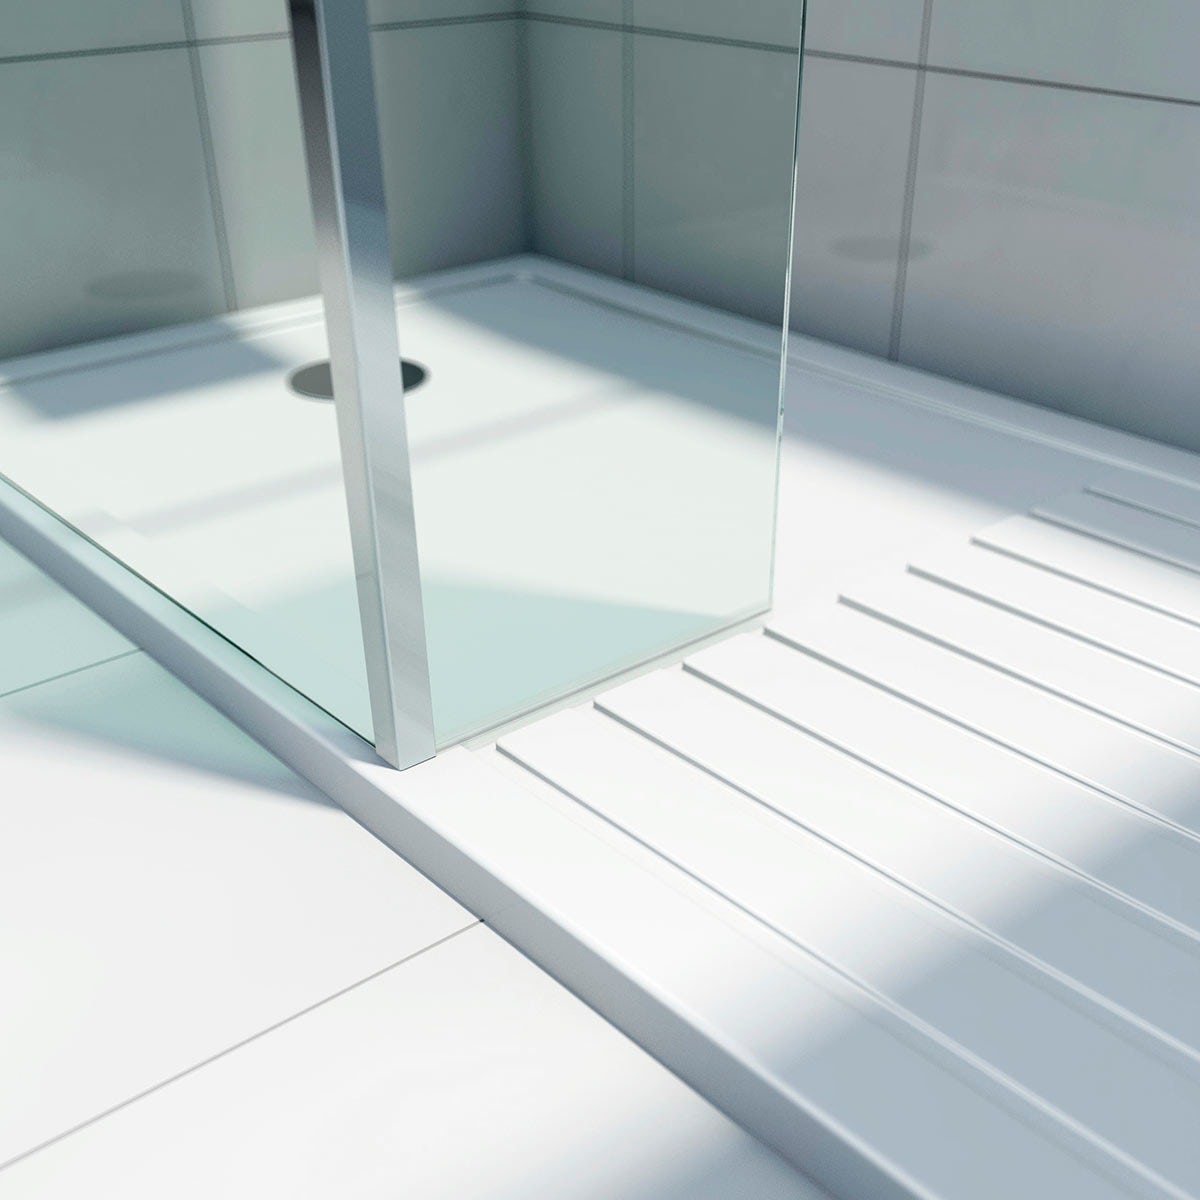 1400mm Pivot Hinge Shower Door 6mm Thick Glass Screen